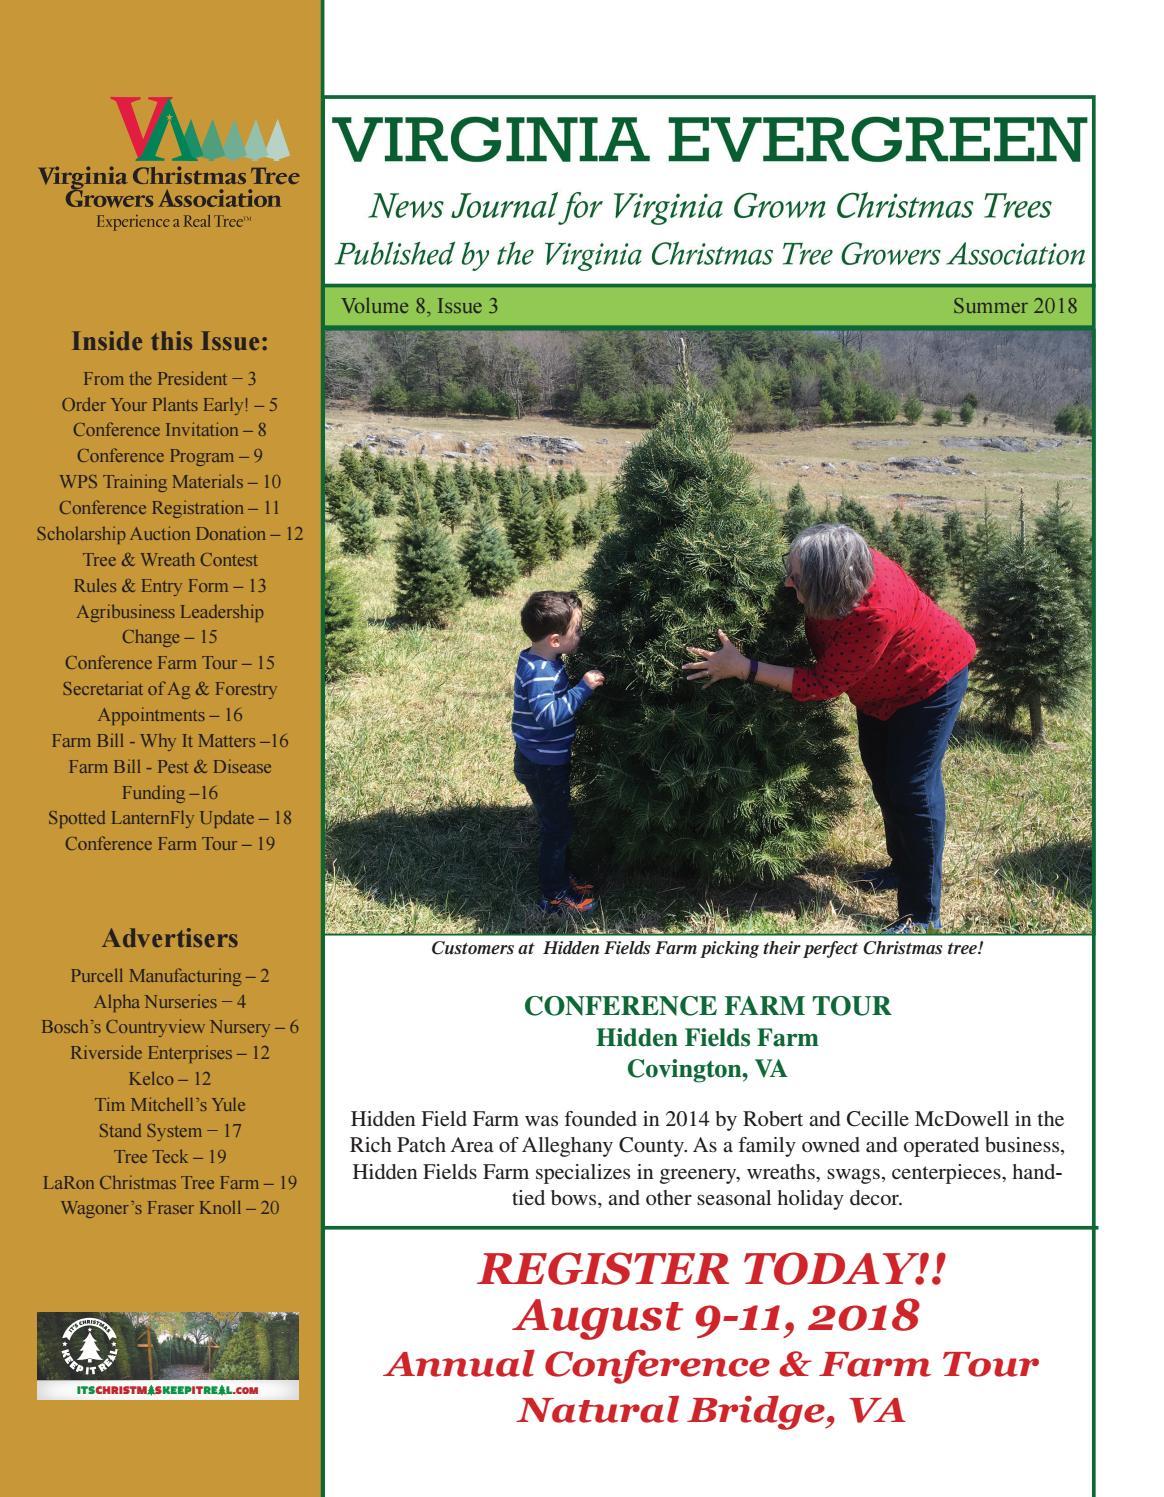 VCTGA Virginia Evergreen News Journal Summer 2018 by Jeff Miller - issuu